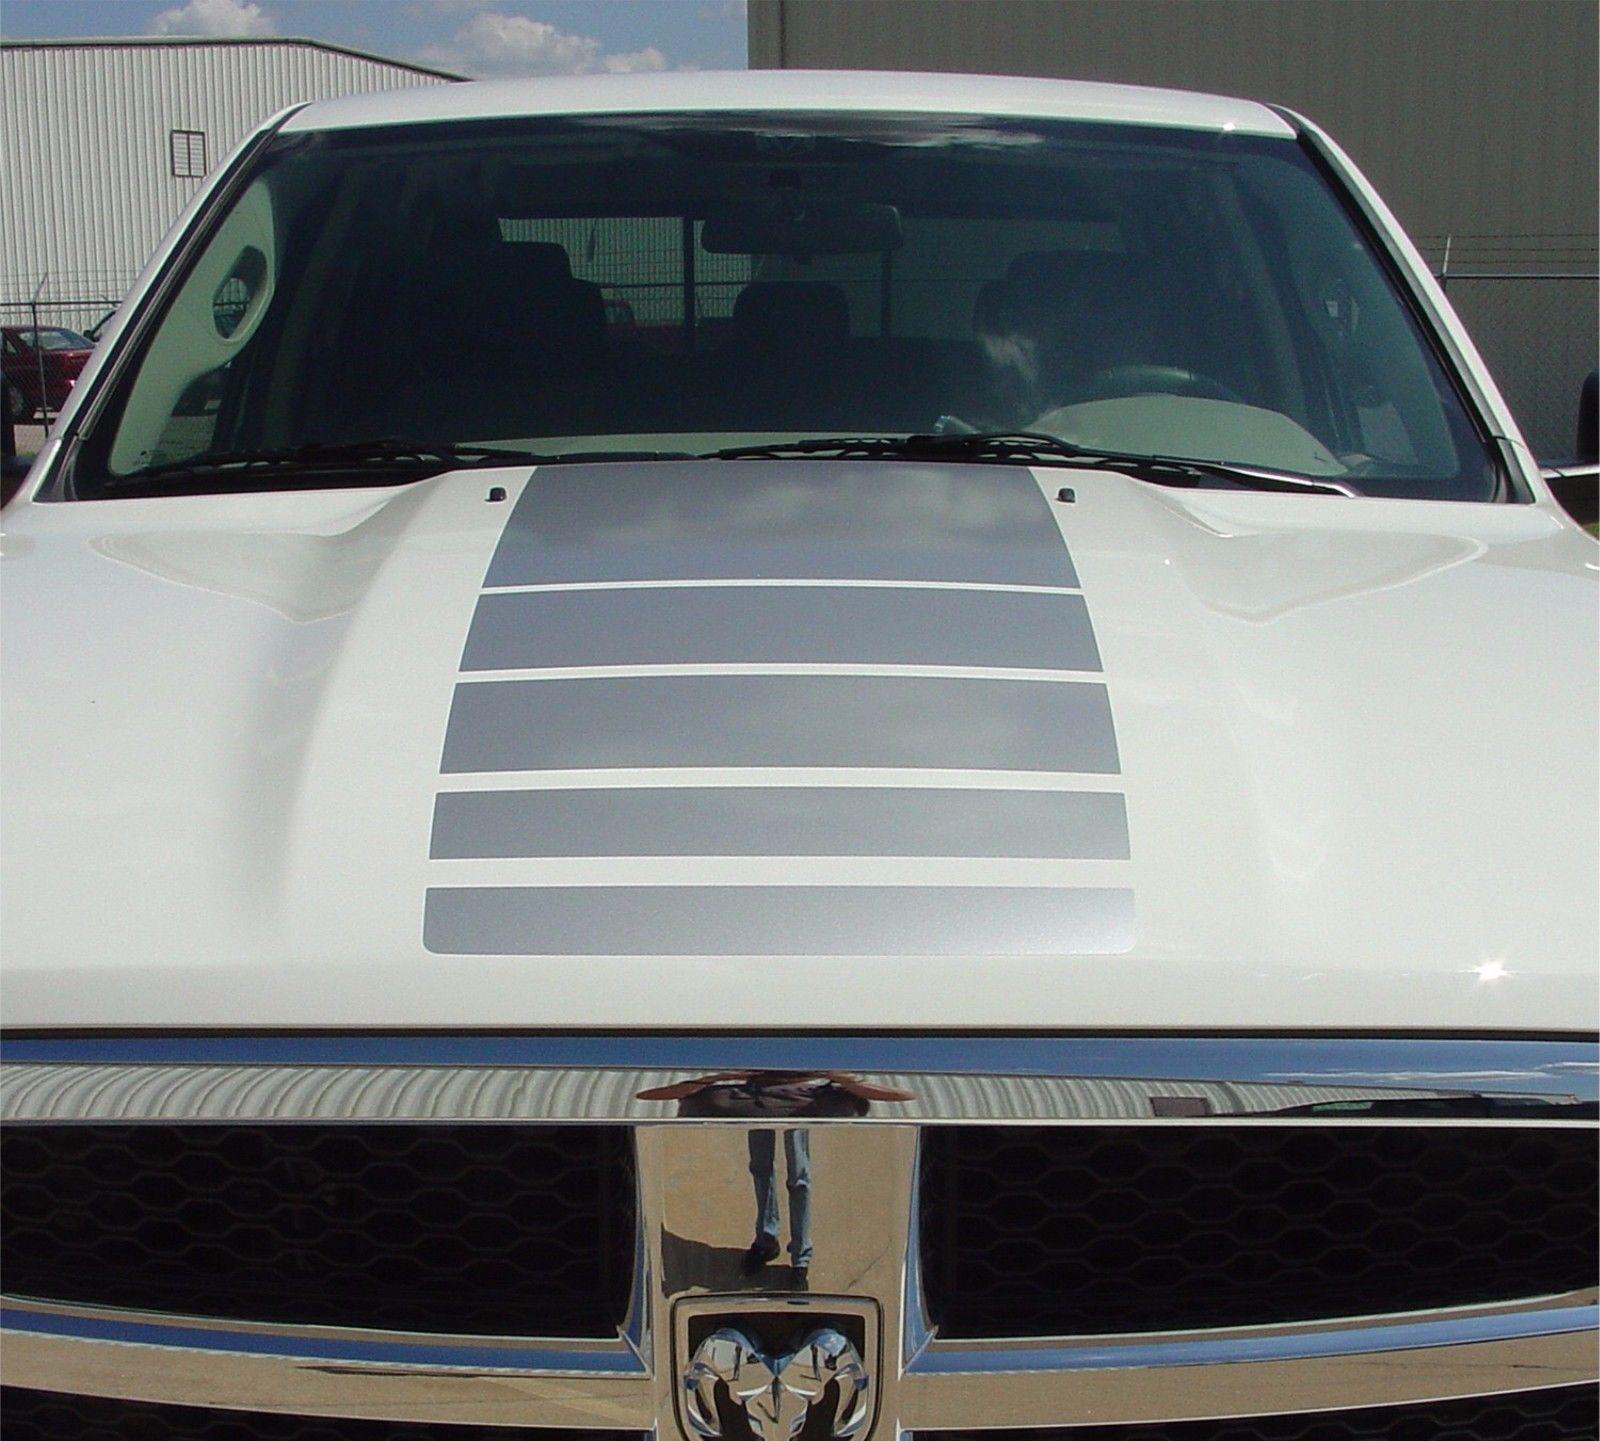 Dodge Ram 1500 Craigslist: Dodge Ram 1500 Wheels For Sale